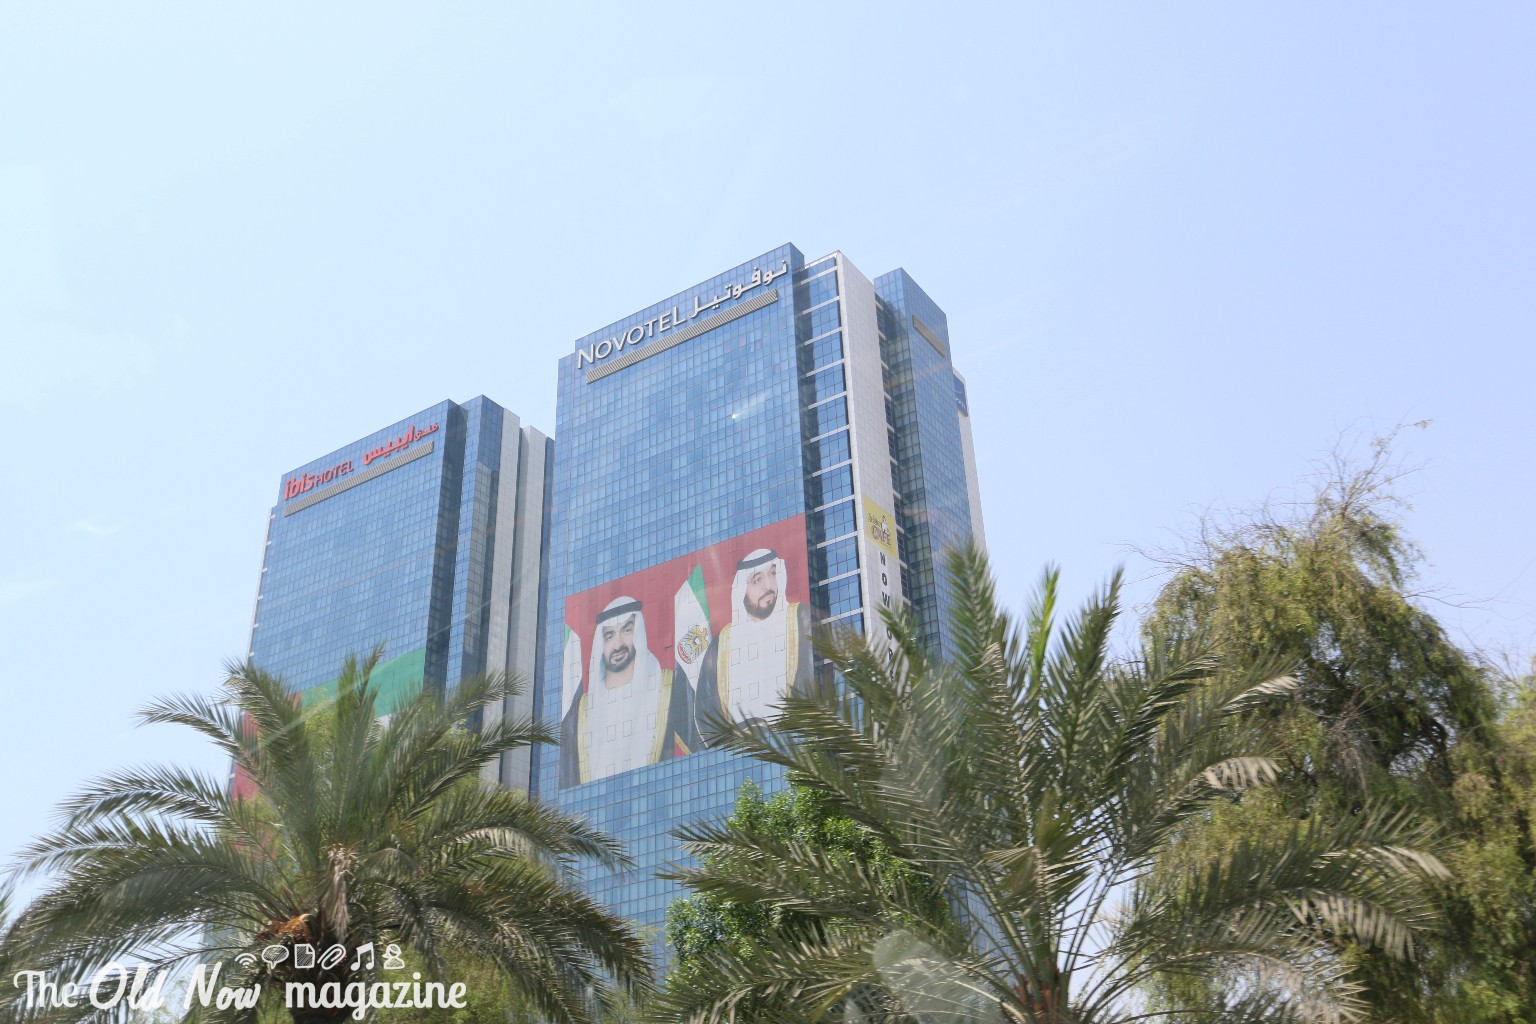 Abu Dhabi THEOLDNOW (4)